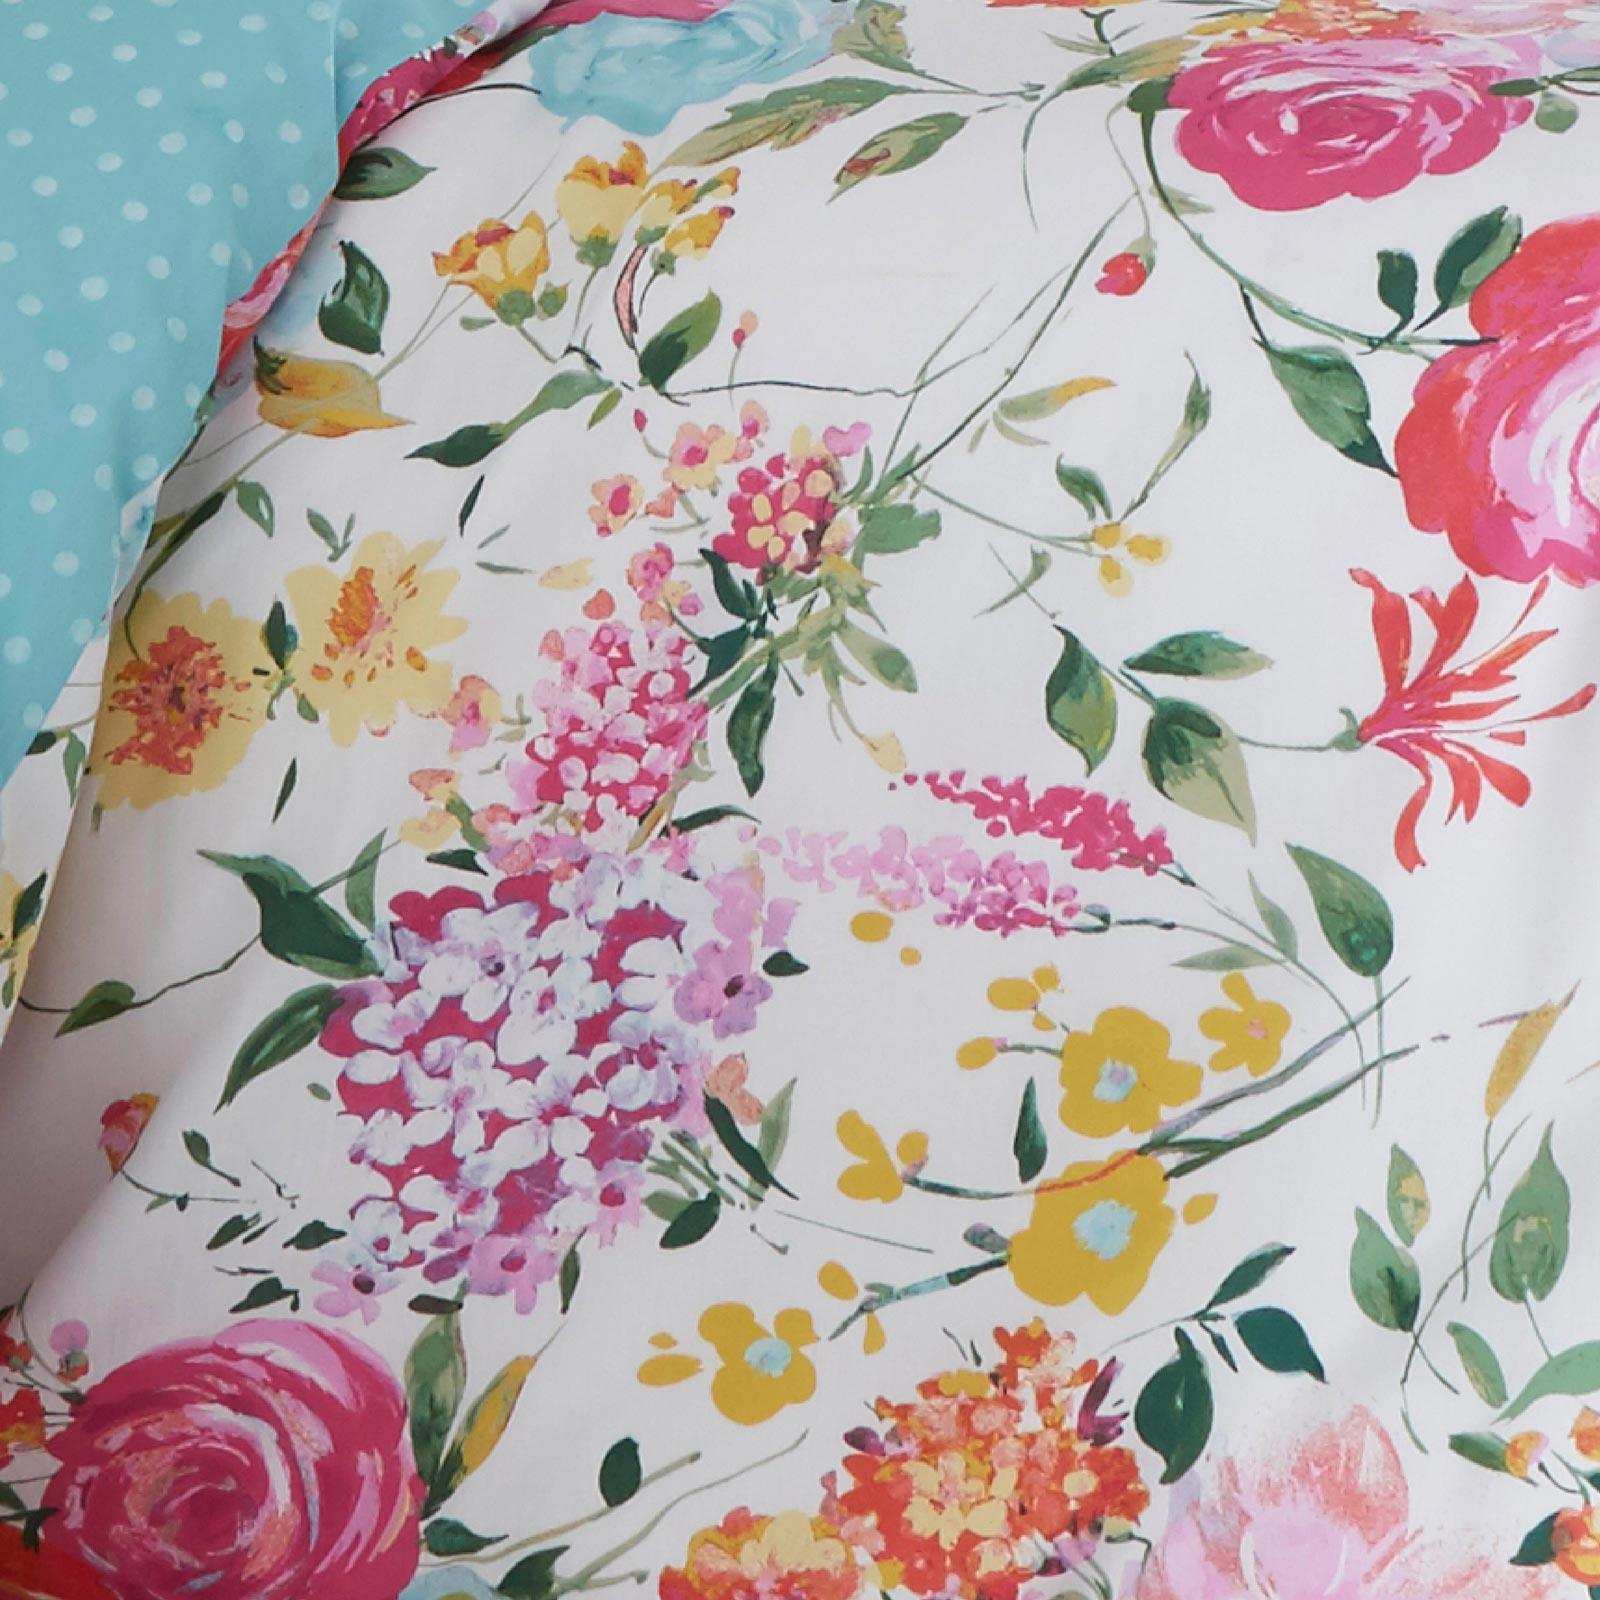 Catherine-Lansfield-Salisbury-Pink-cubierta-del-edredon-edredon-cubre-floral-de-conjuntos-de-cama miniatura 3